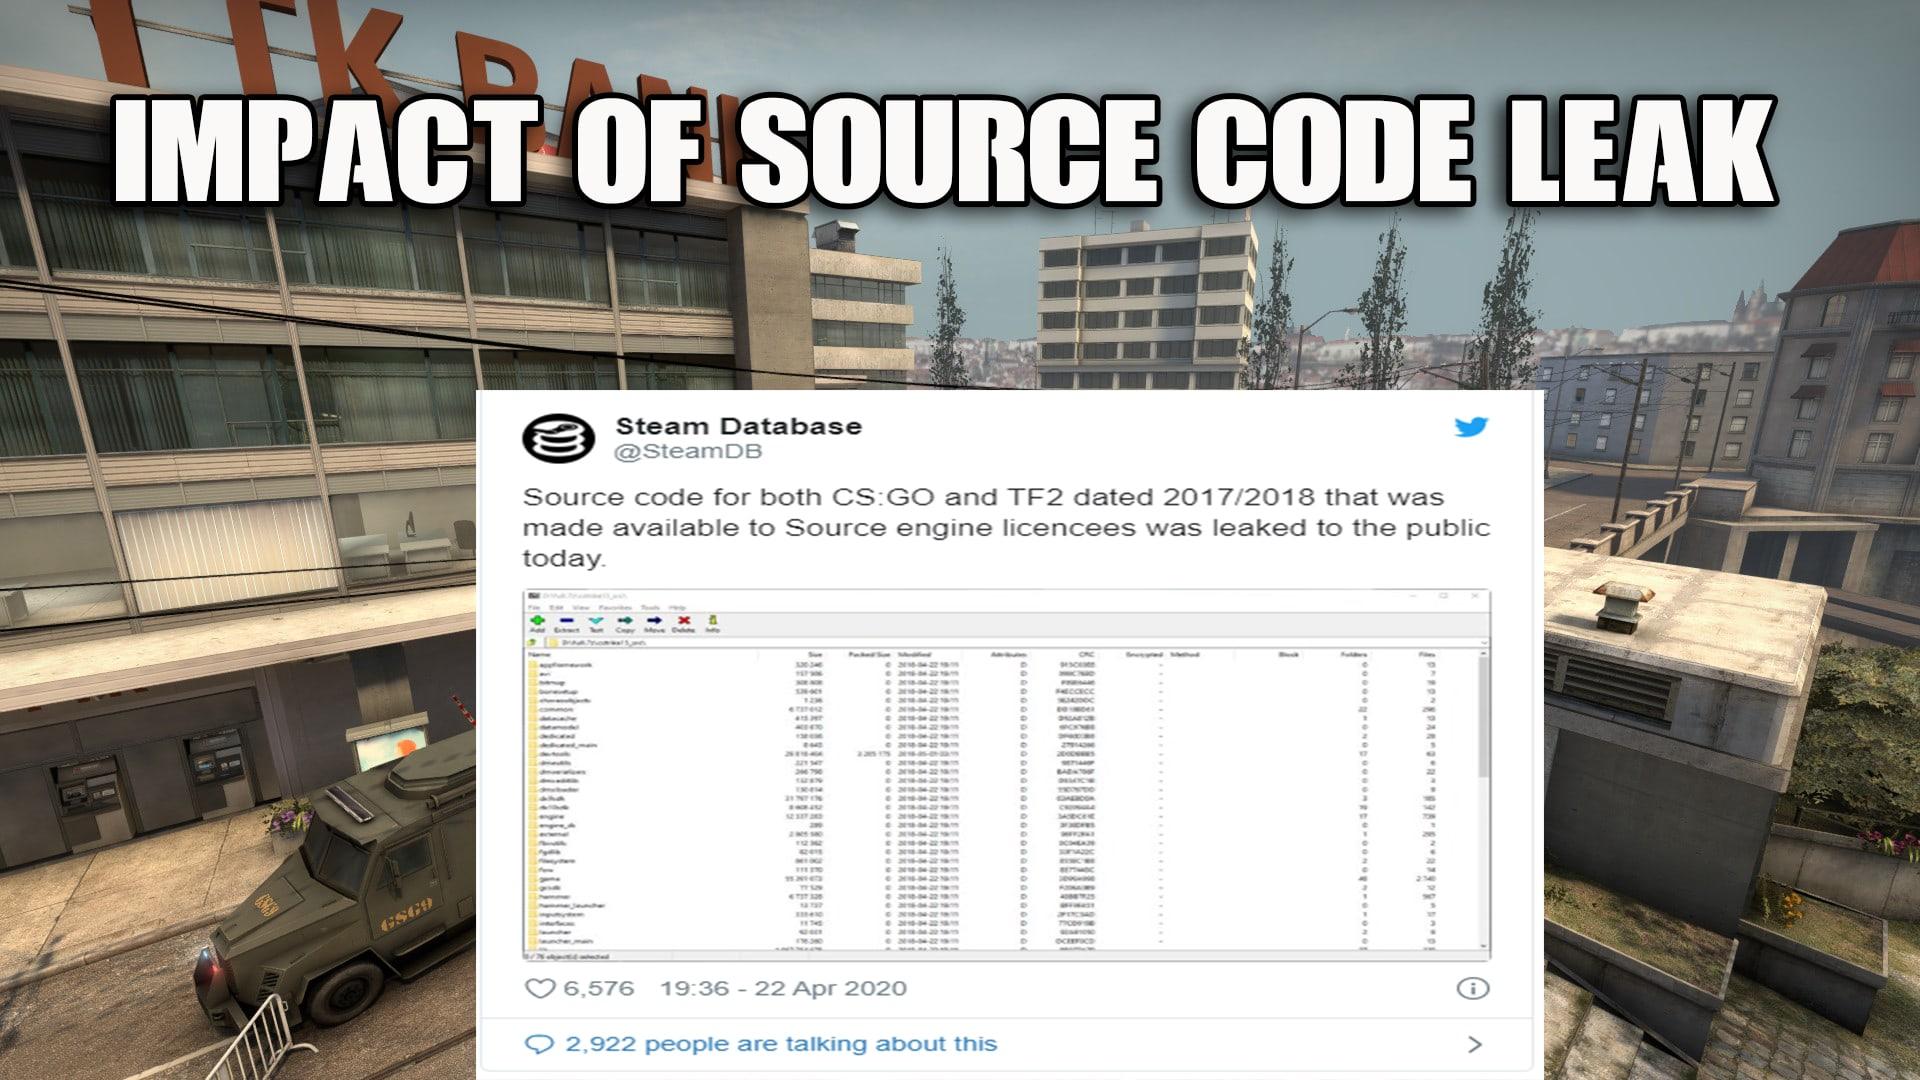 Analyzing the impact of Source-Code leak on CSGO 2